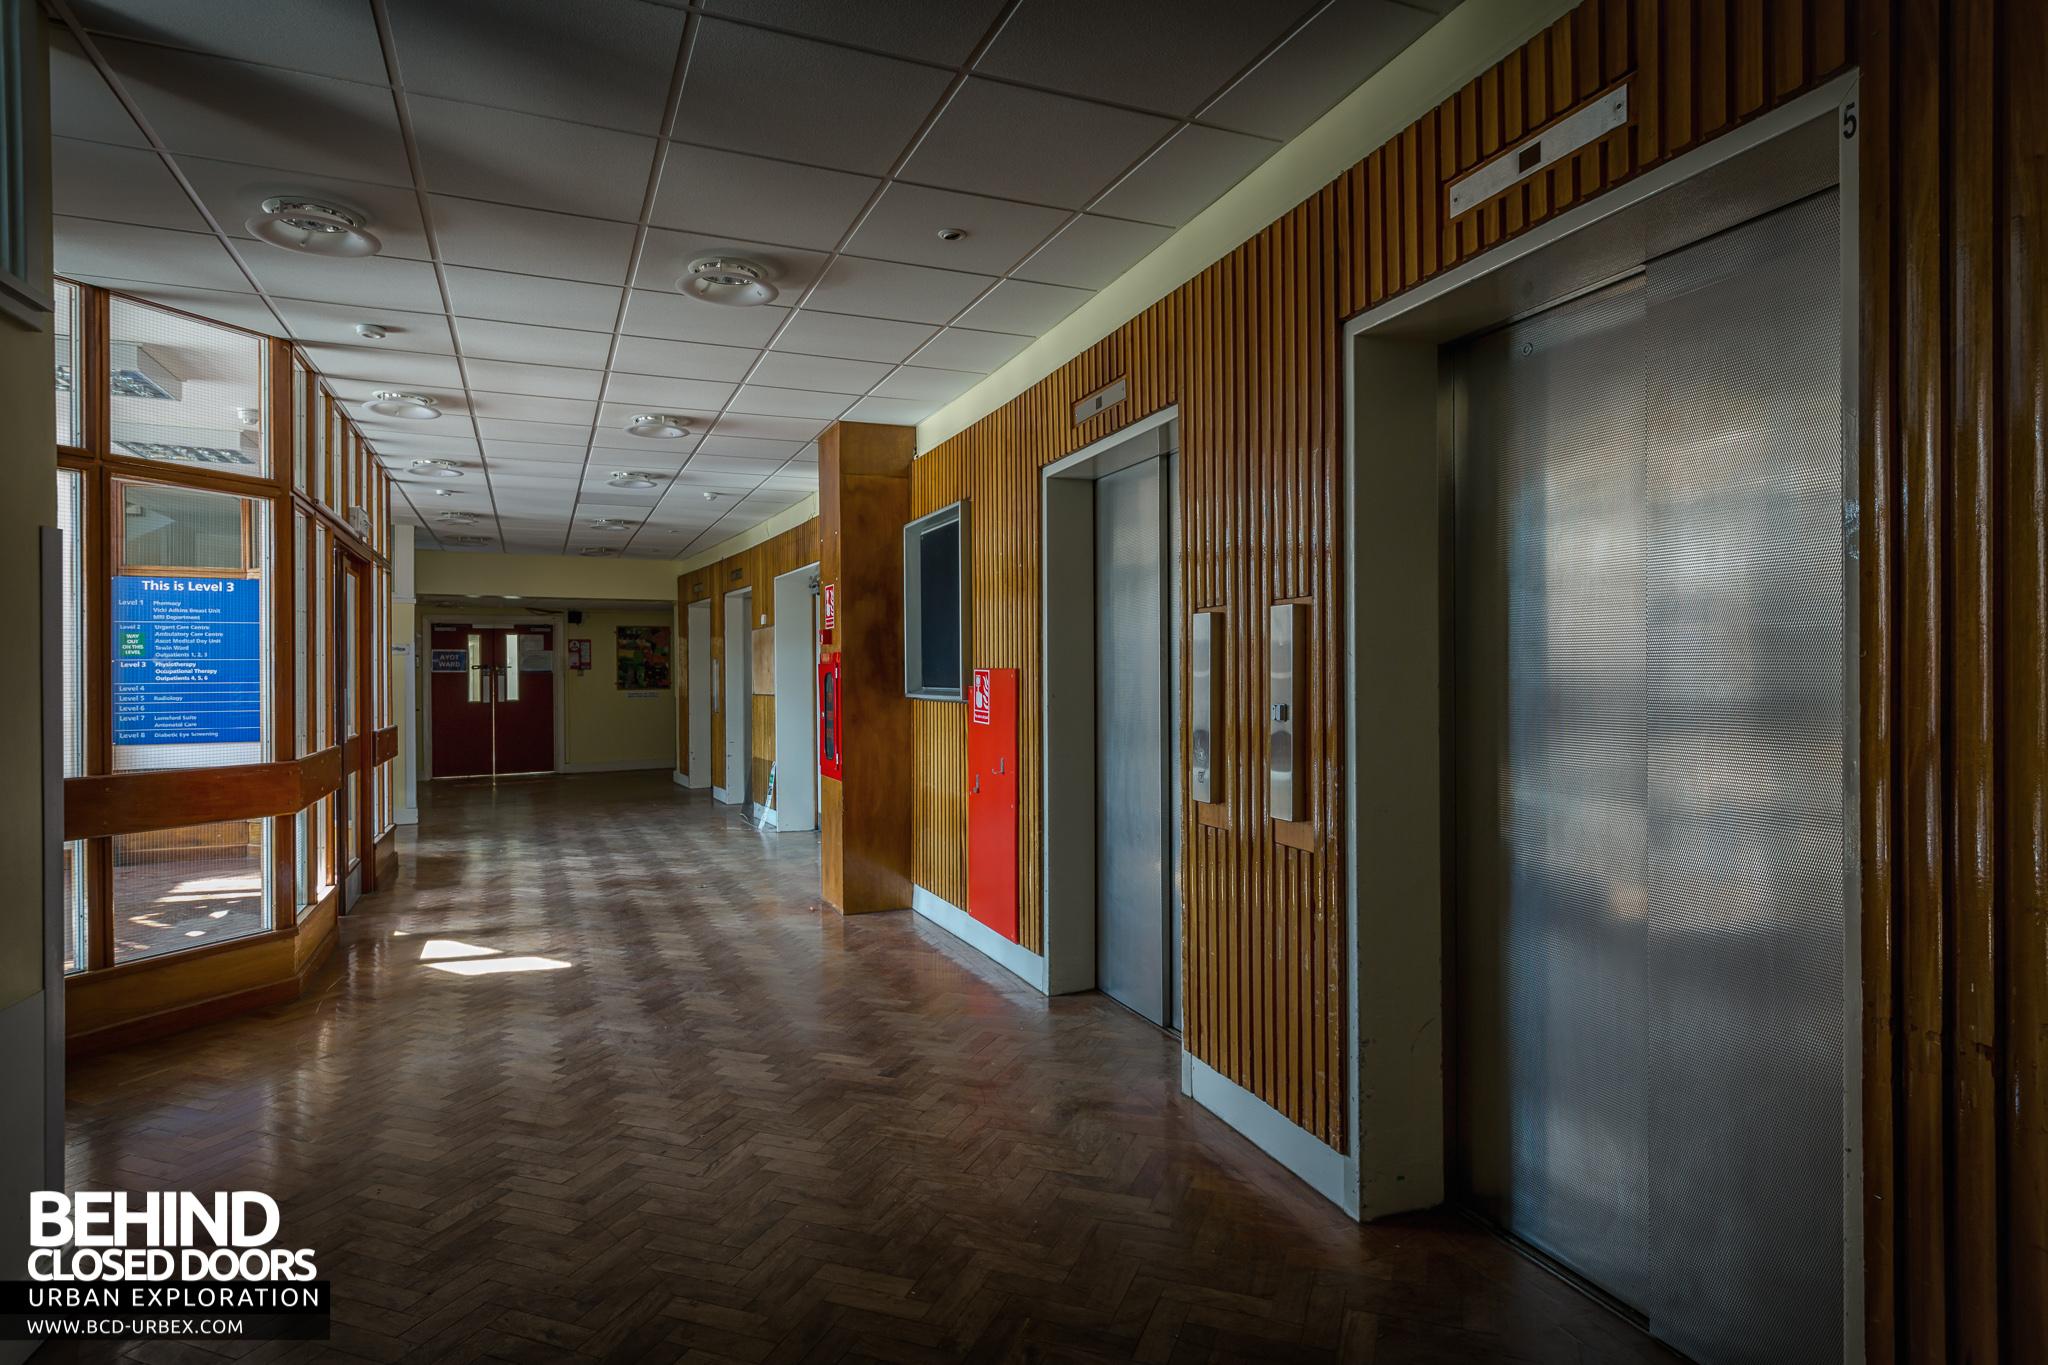 Queen Elizabeth Ii Hospital Welwyn Garden City Uk